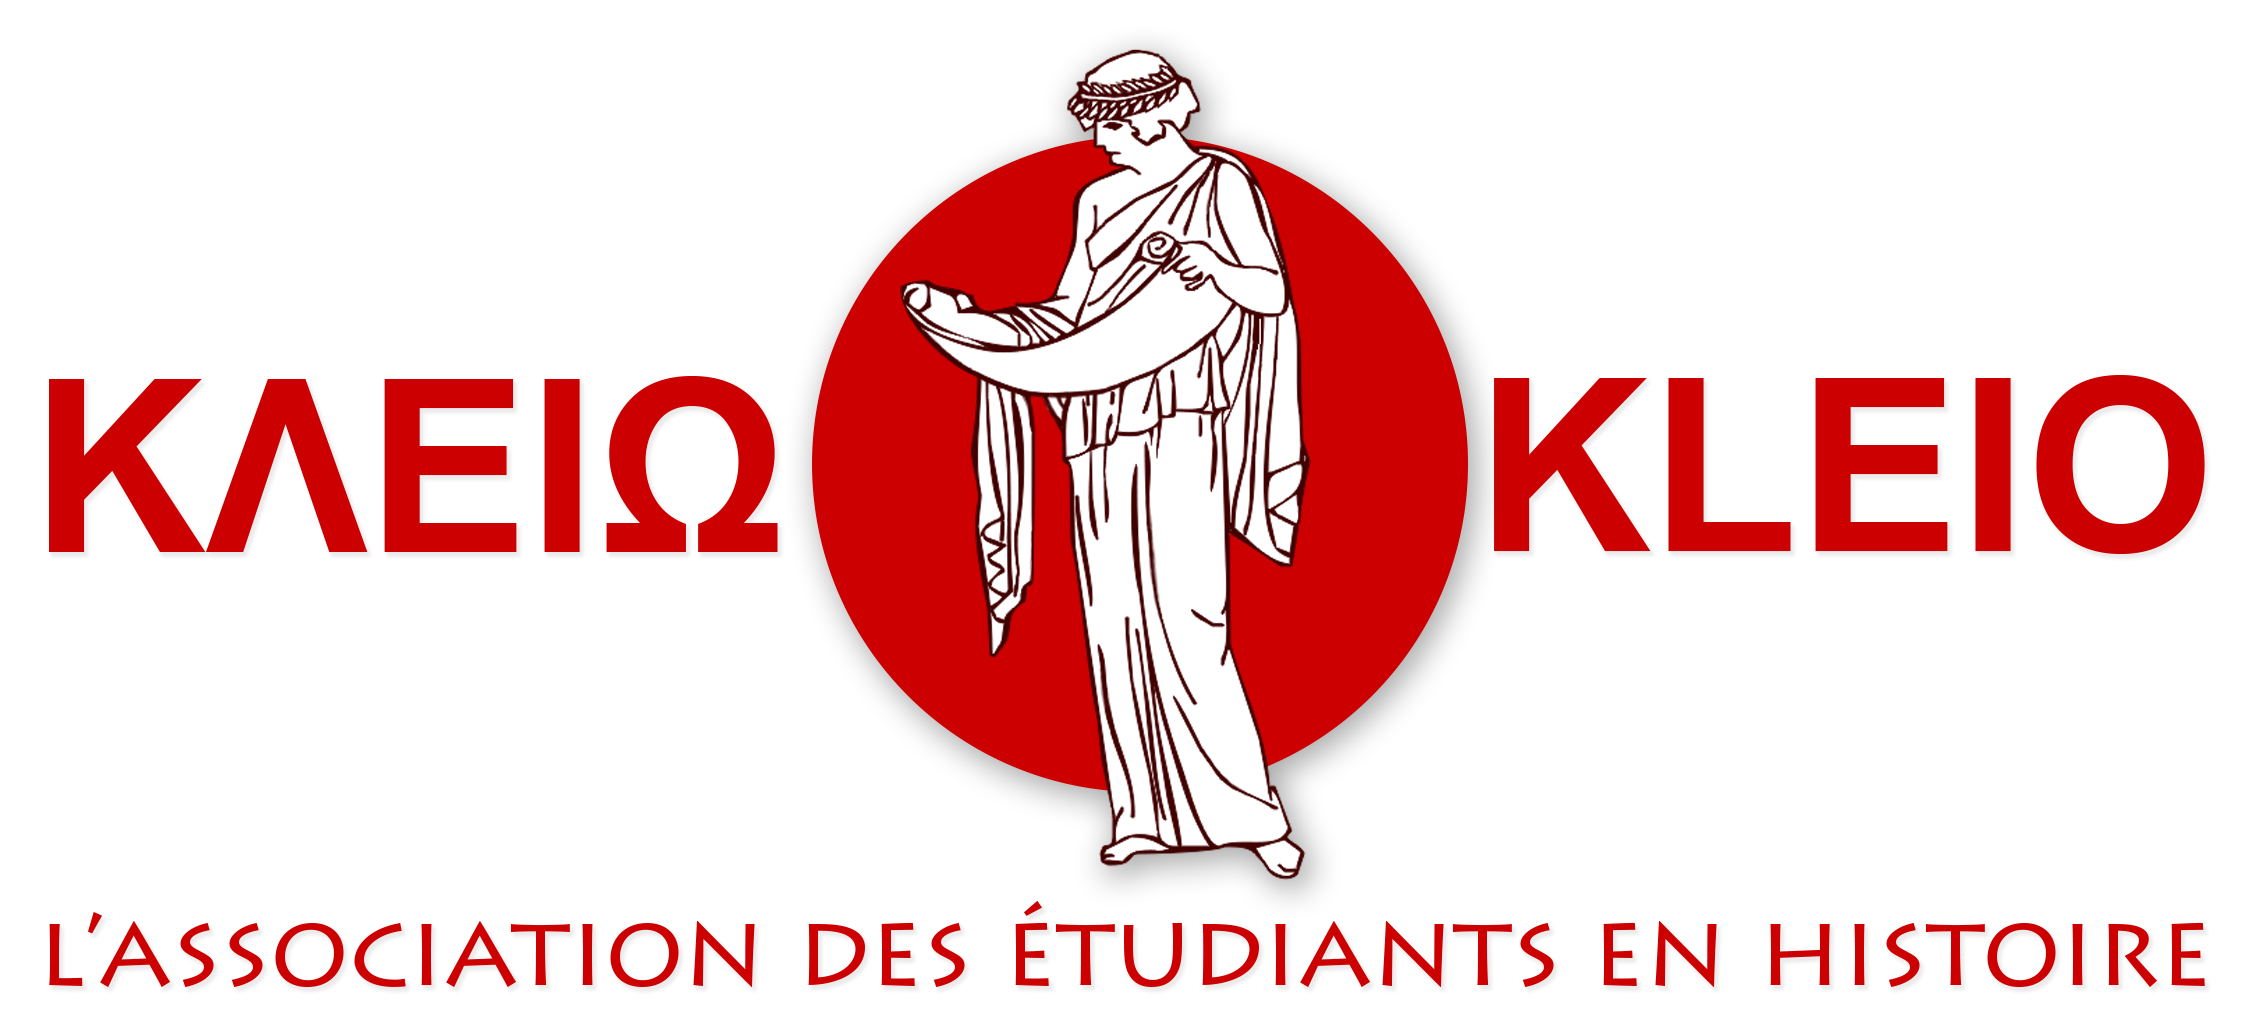 Kleio Logo.png